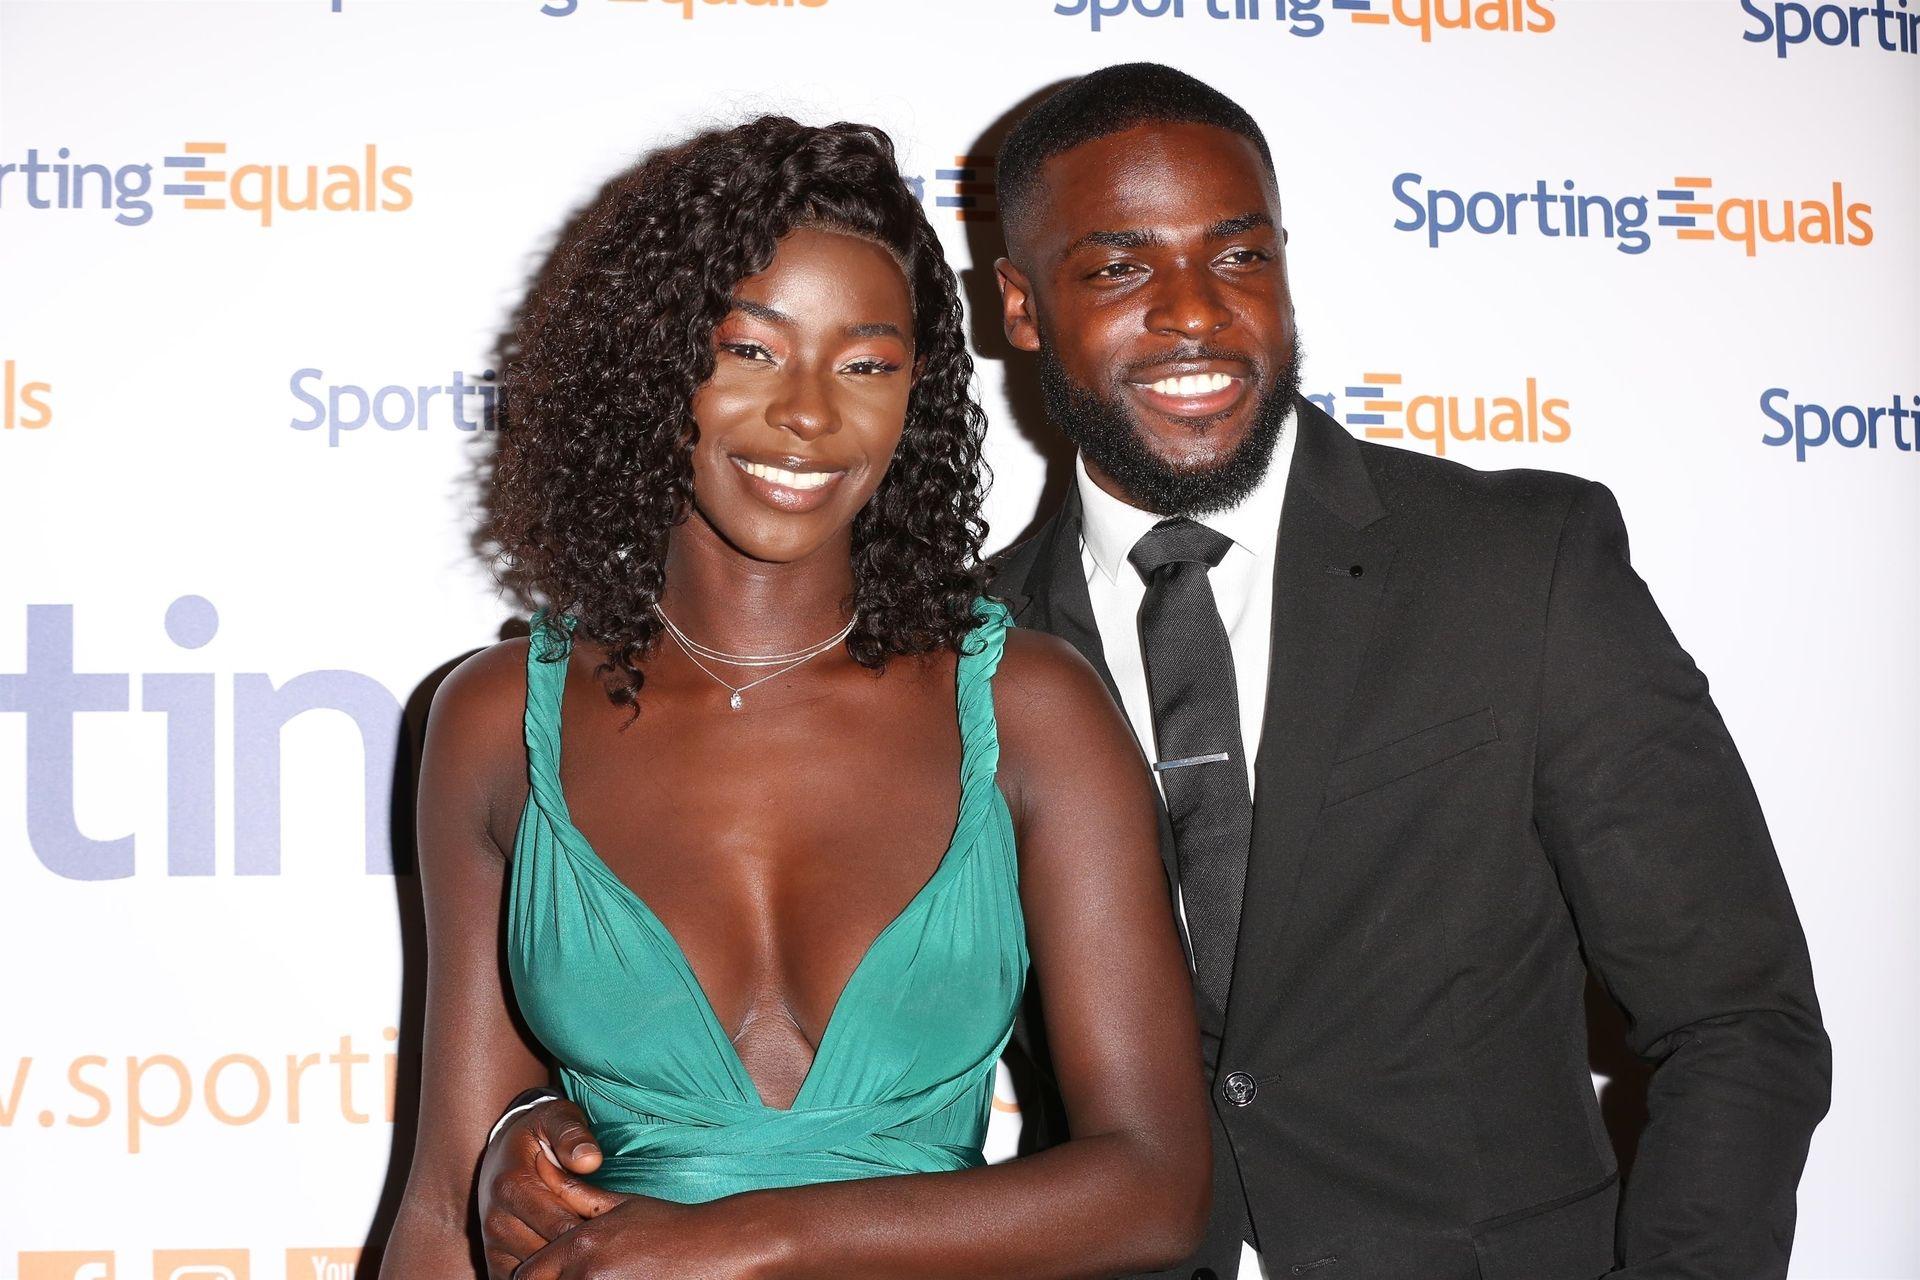 Mike Boateng & Priscilla Anyabu Are Seen At British Ethnic Diversity Sports Awards 0119